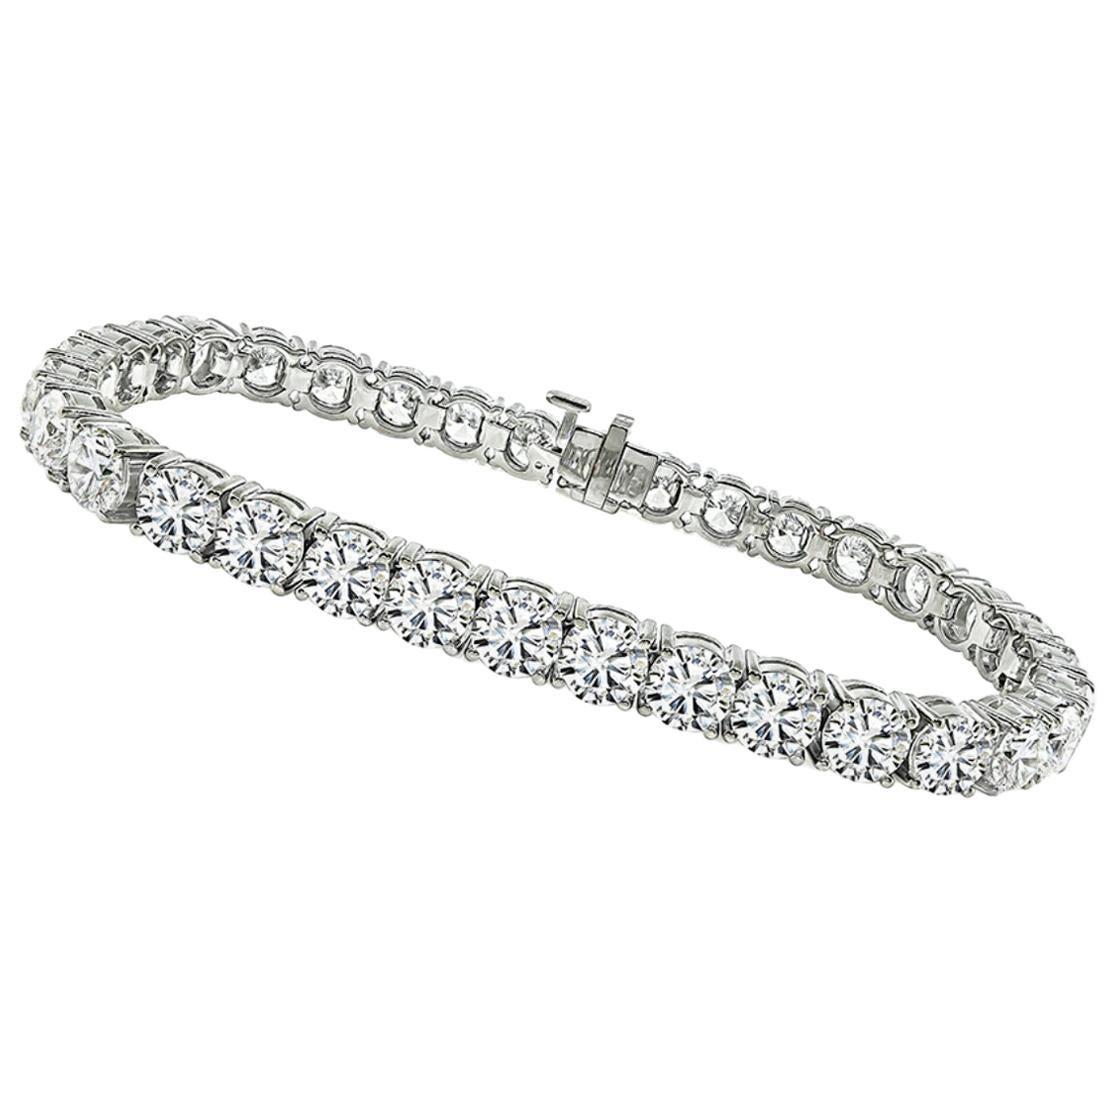 GIA Certified 17.54 Carat Diamond Gold Tennis Bracelet